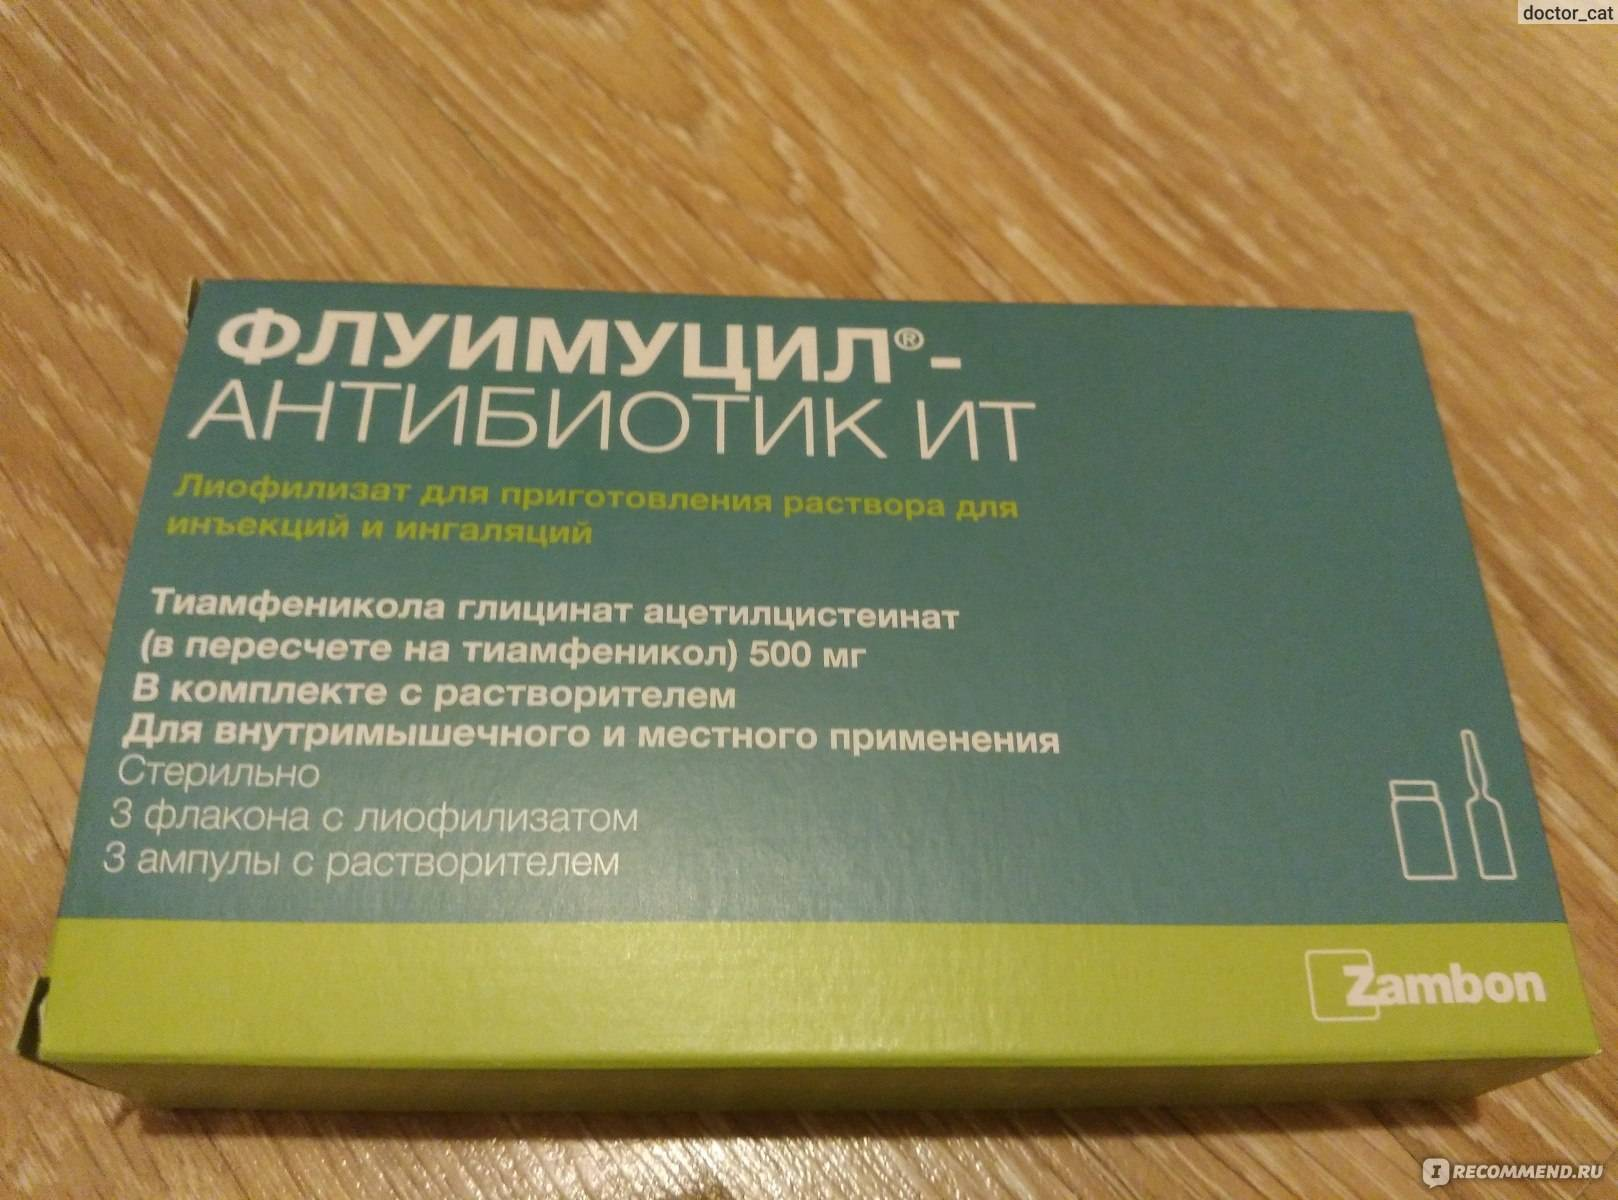 Флуимуцил-антибиотик ит для ингаляций